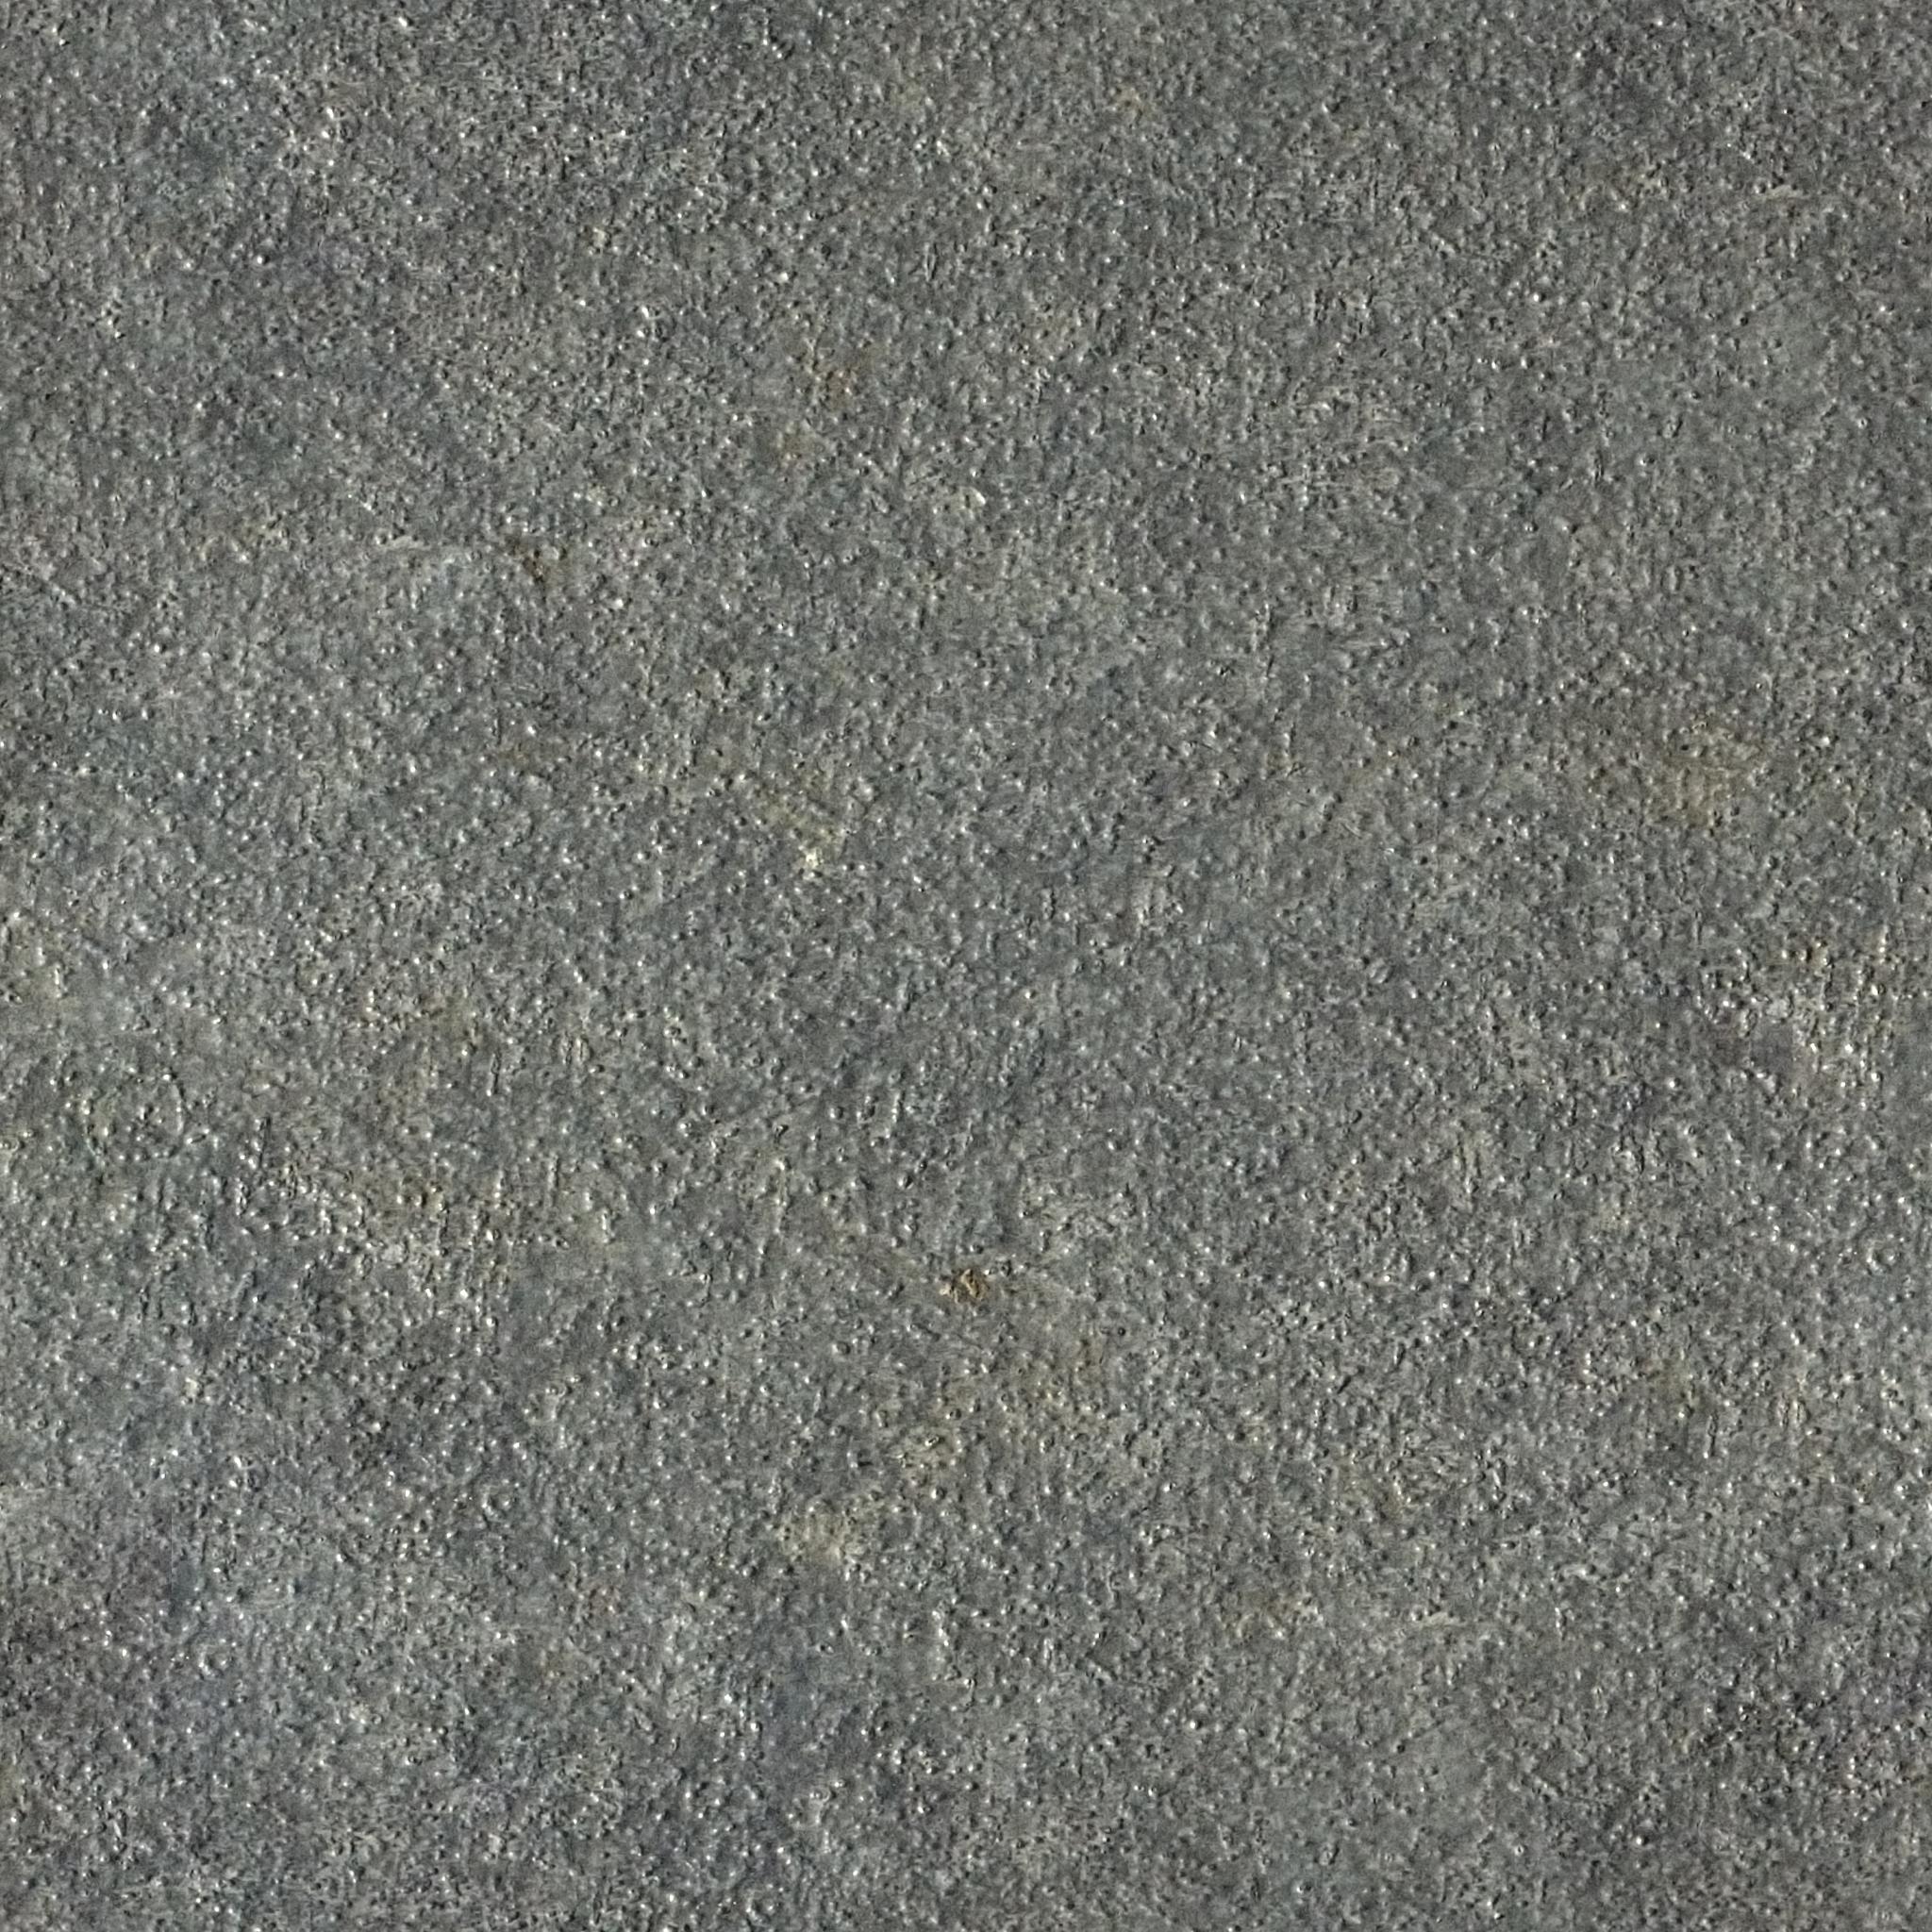 Coarse Grey Steel.jpg